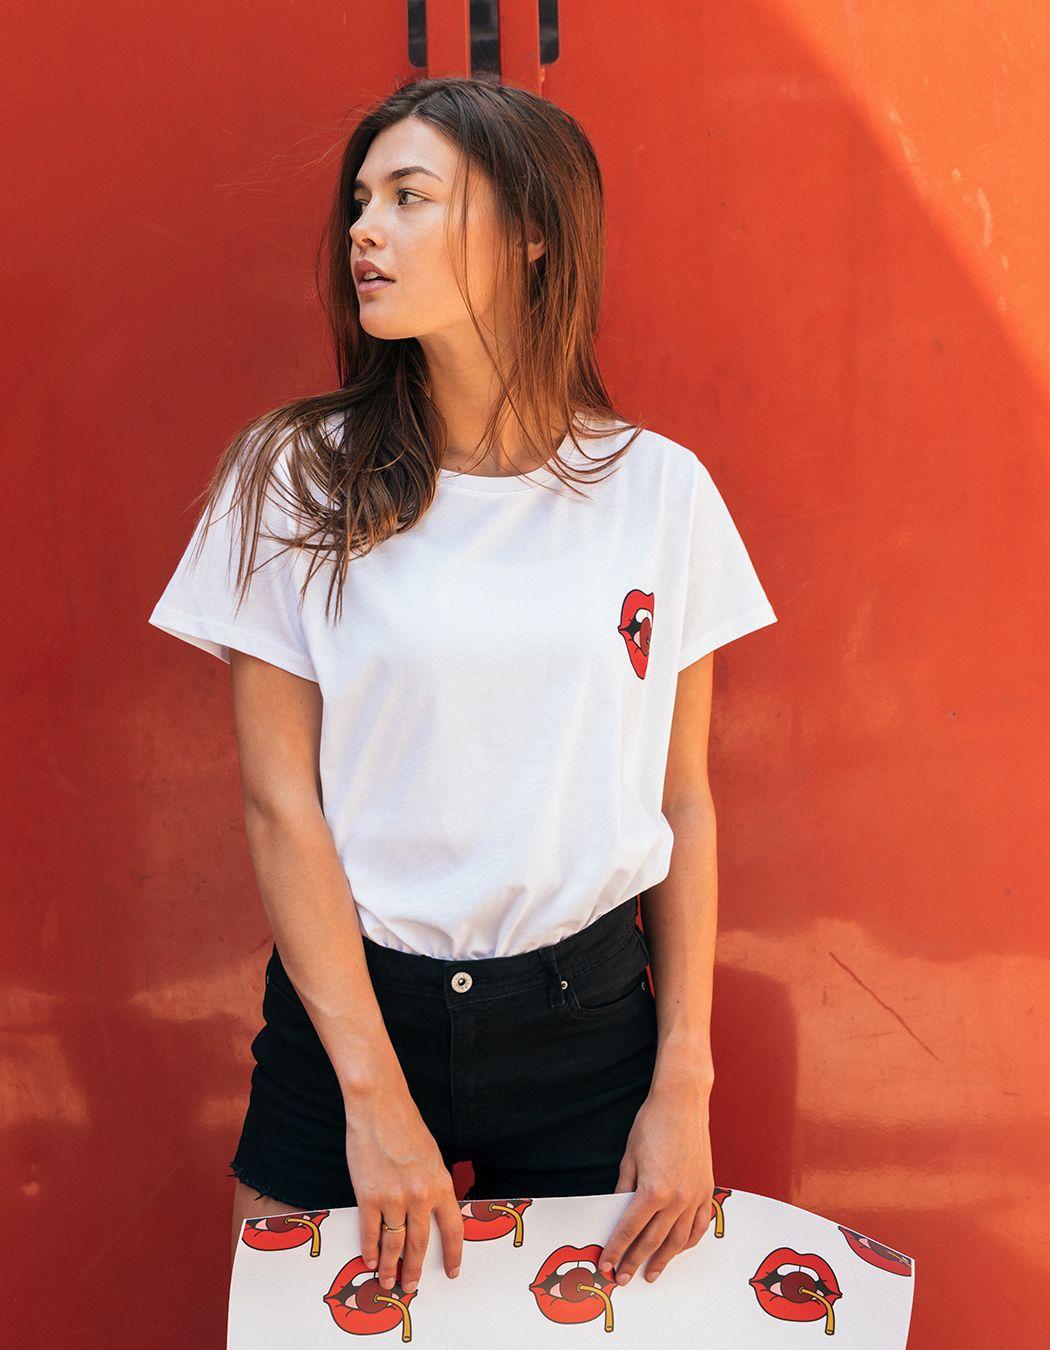 1acf3c814 LIPS. #fashion #editorial #photography #model #new #tees #whiteshirt ...